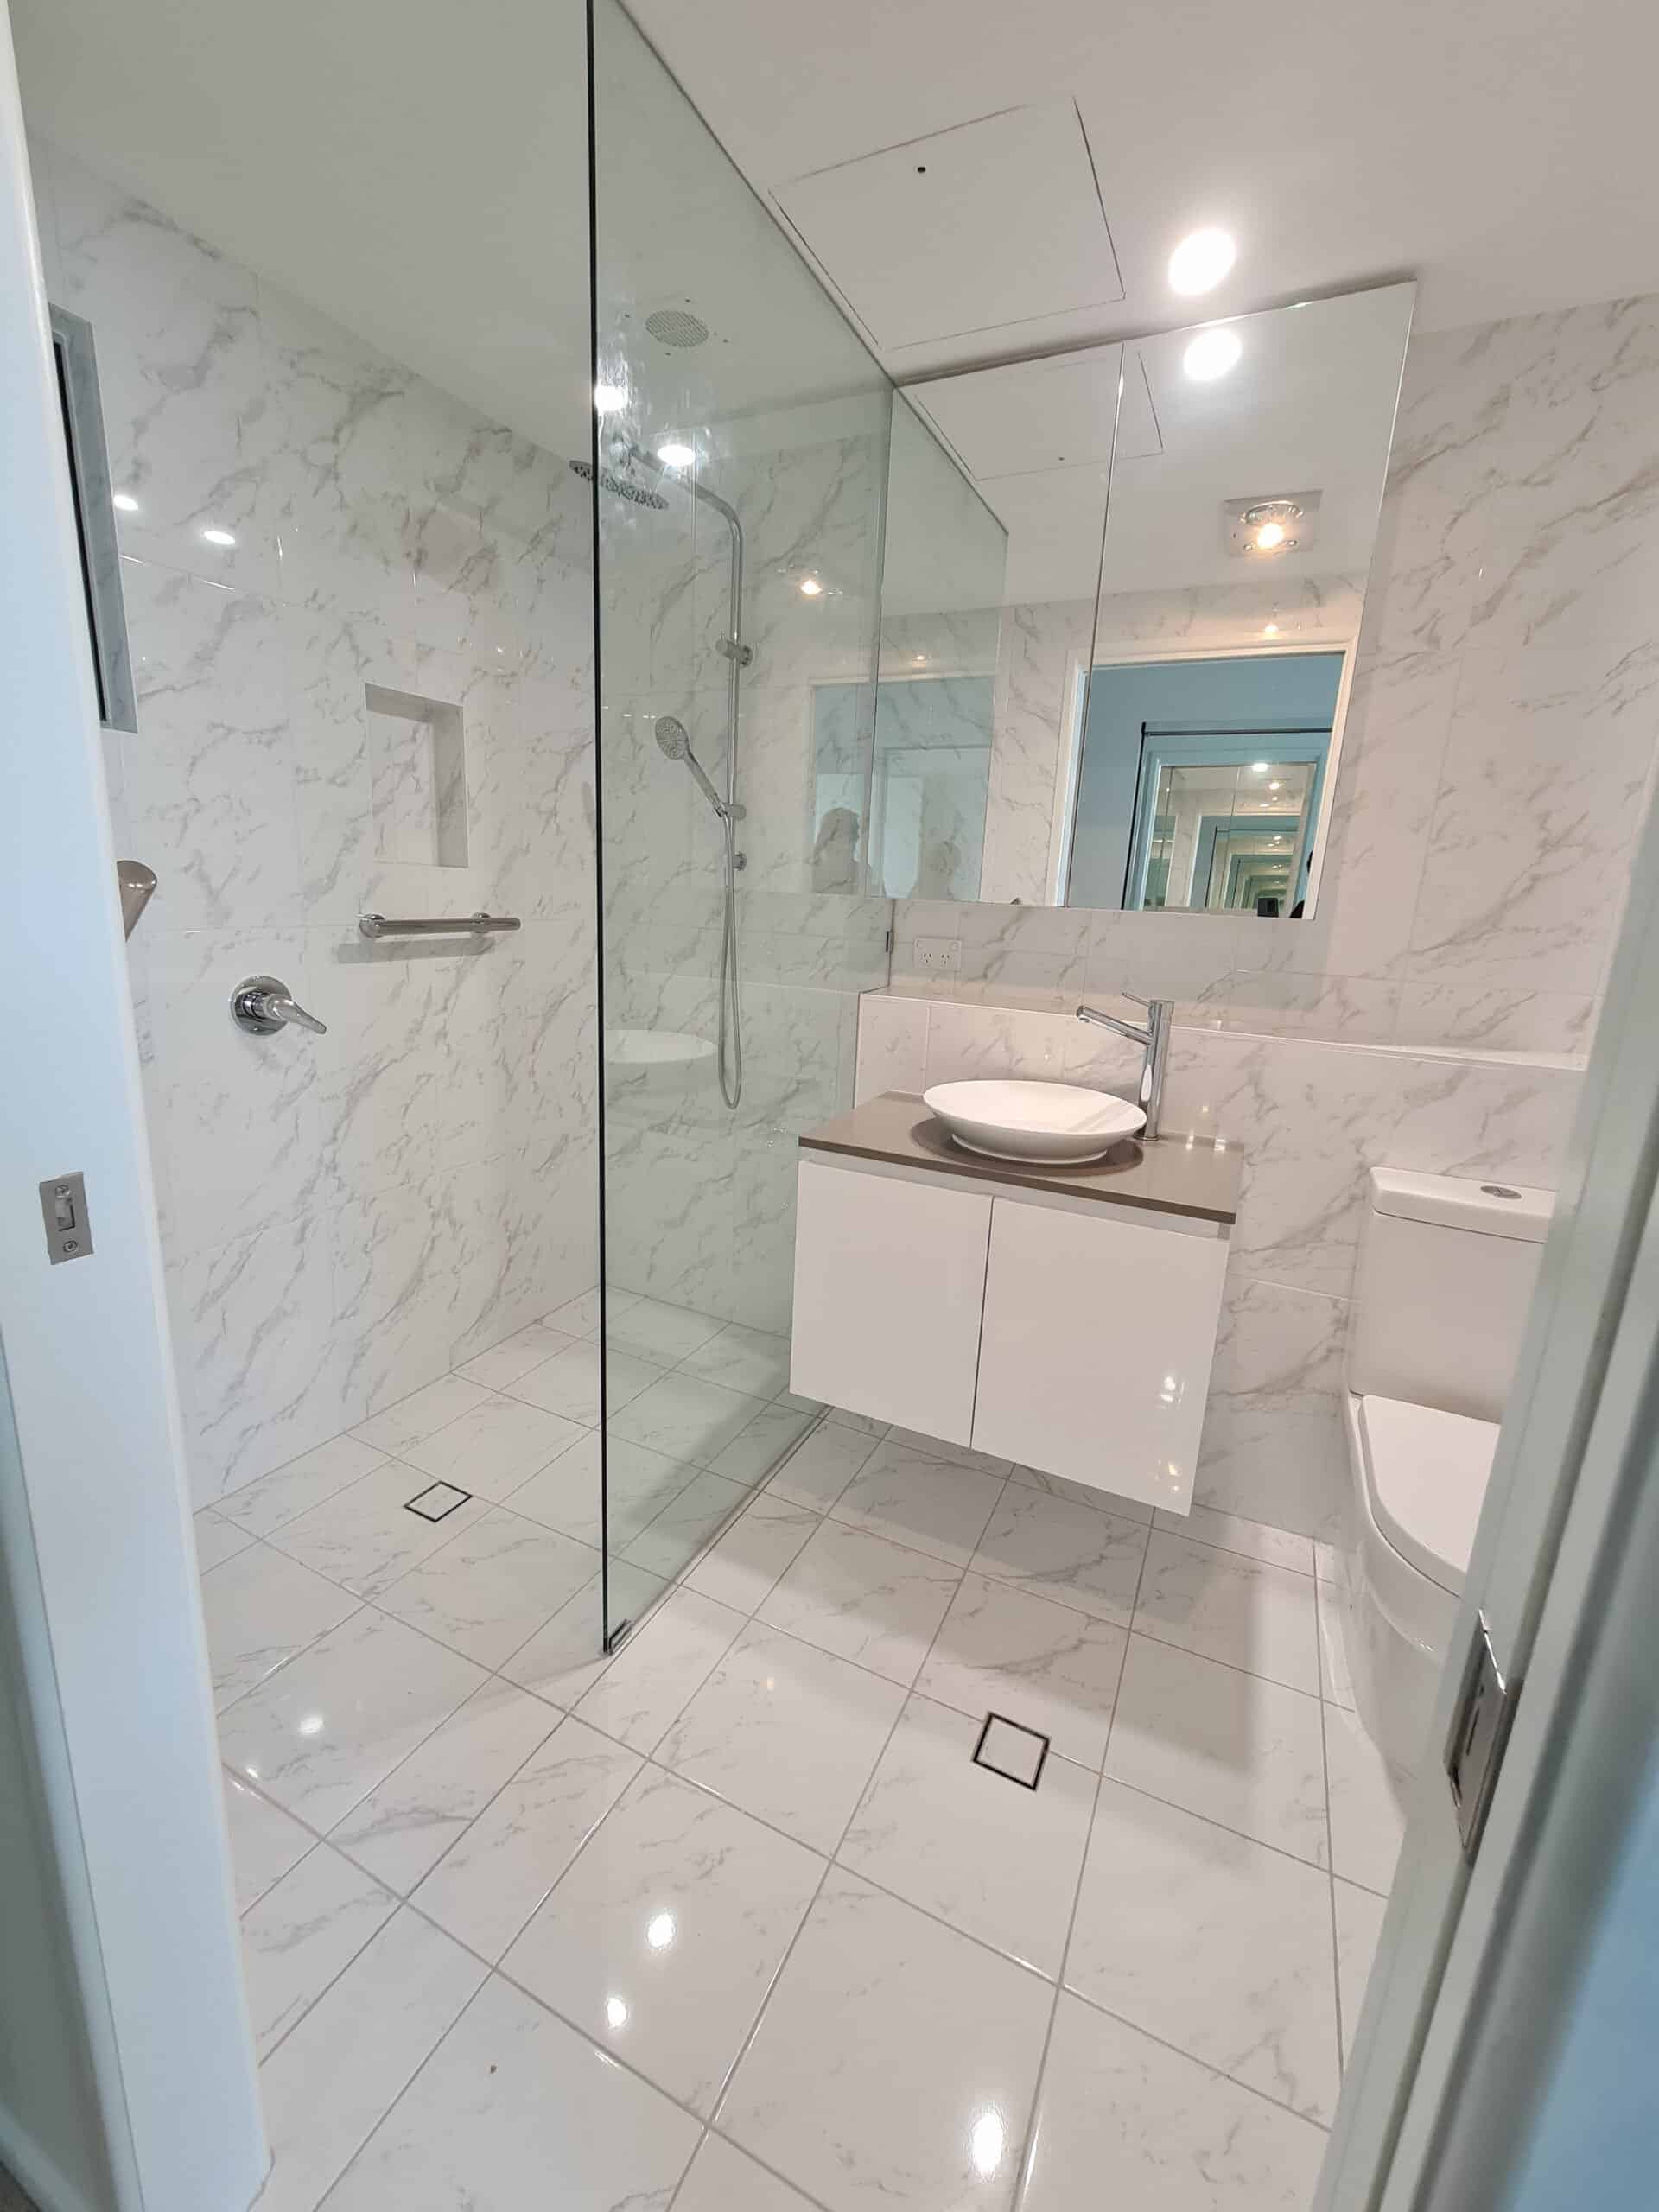 Kangaroo point bathroom renovation